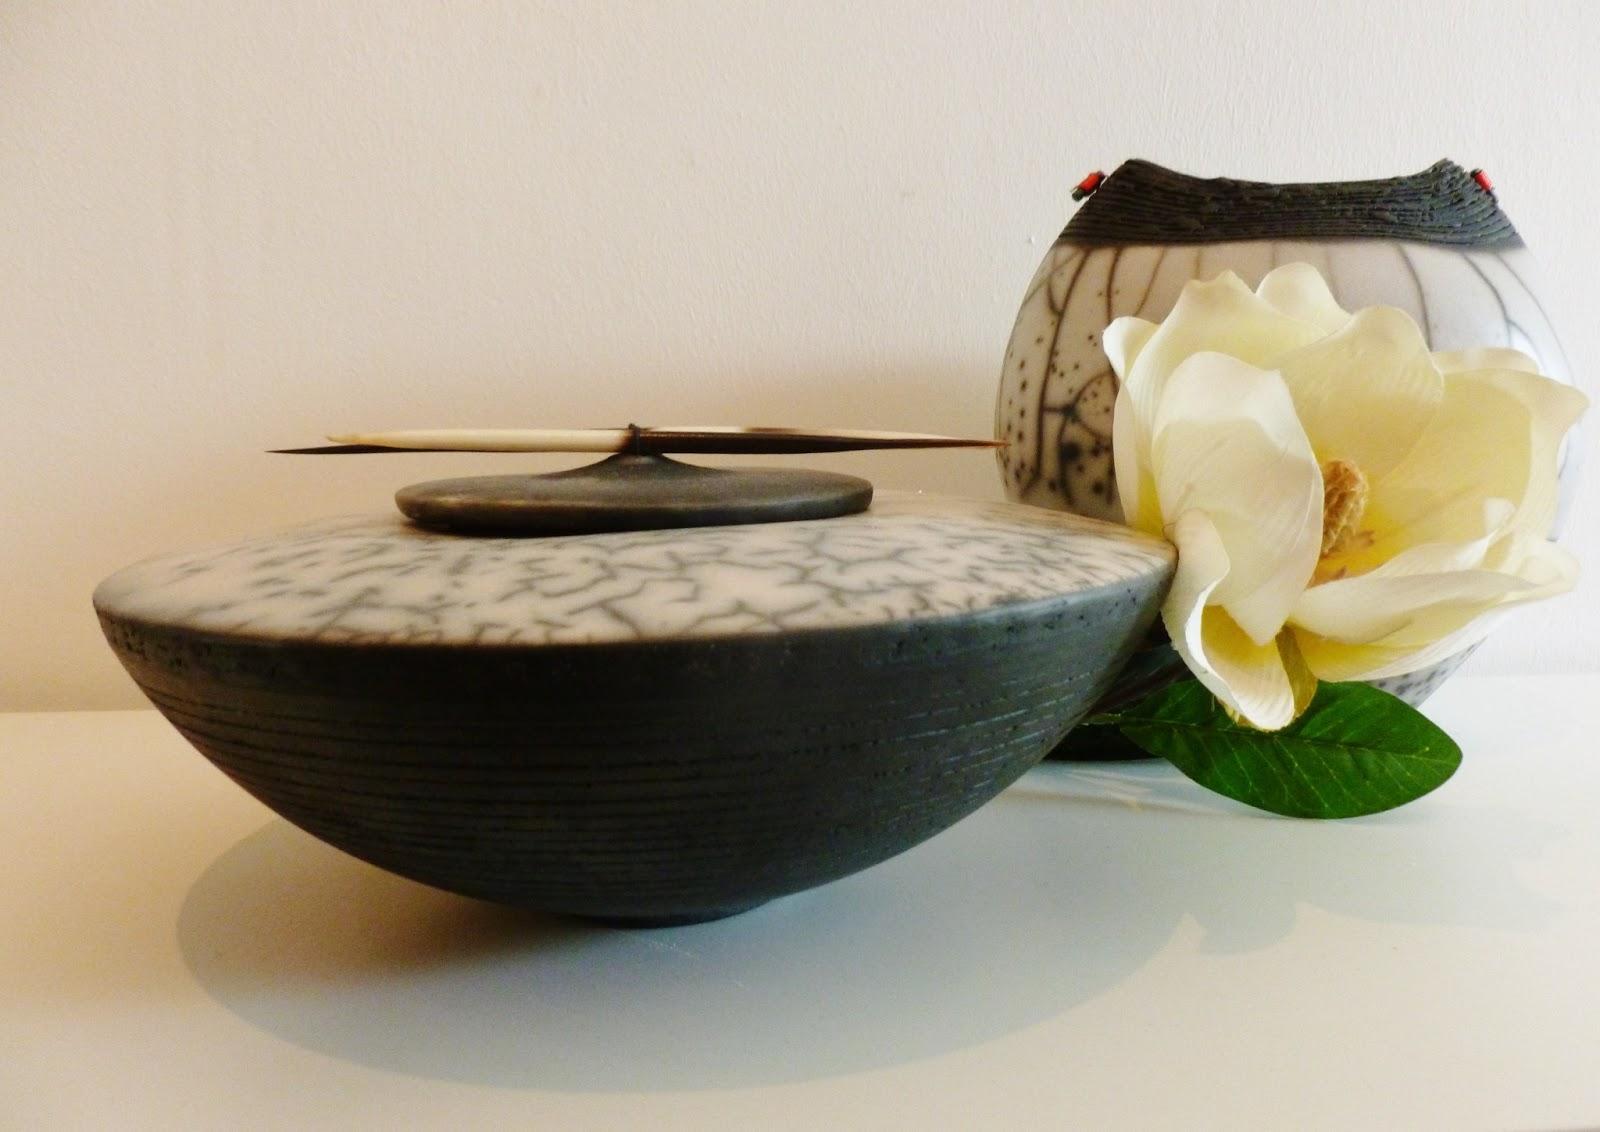 angelika jansen keramik design bei peperblom peperblom handwerkskunst design mode. Black Bedroom Furniture Sets. Home Design Ideas